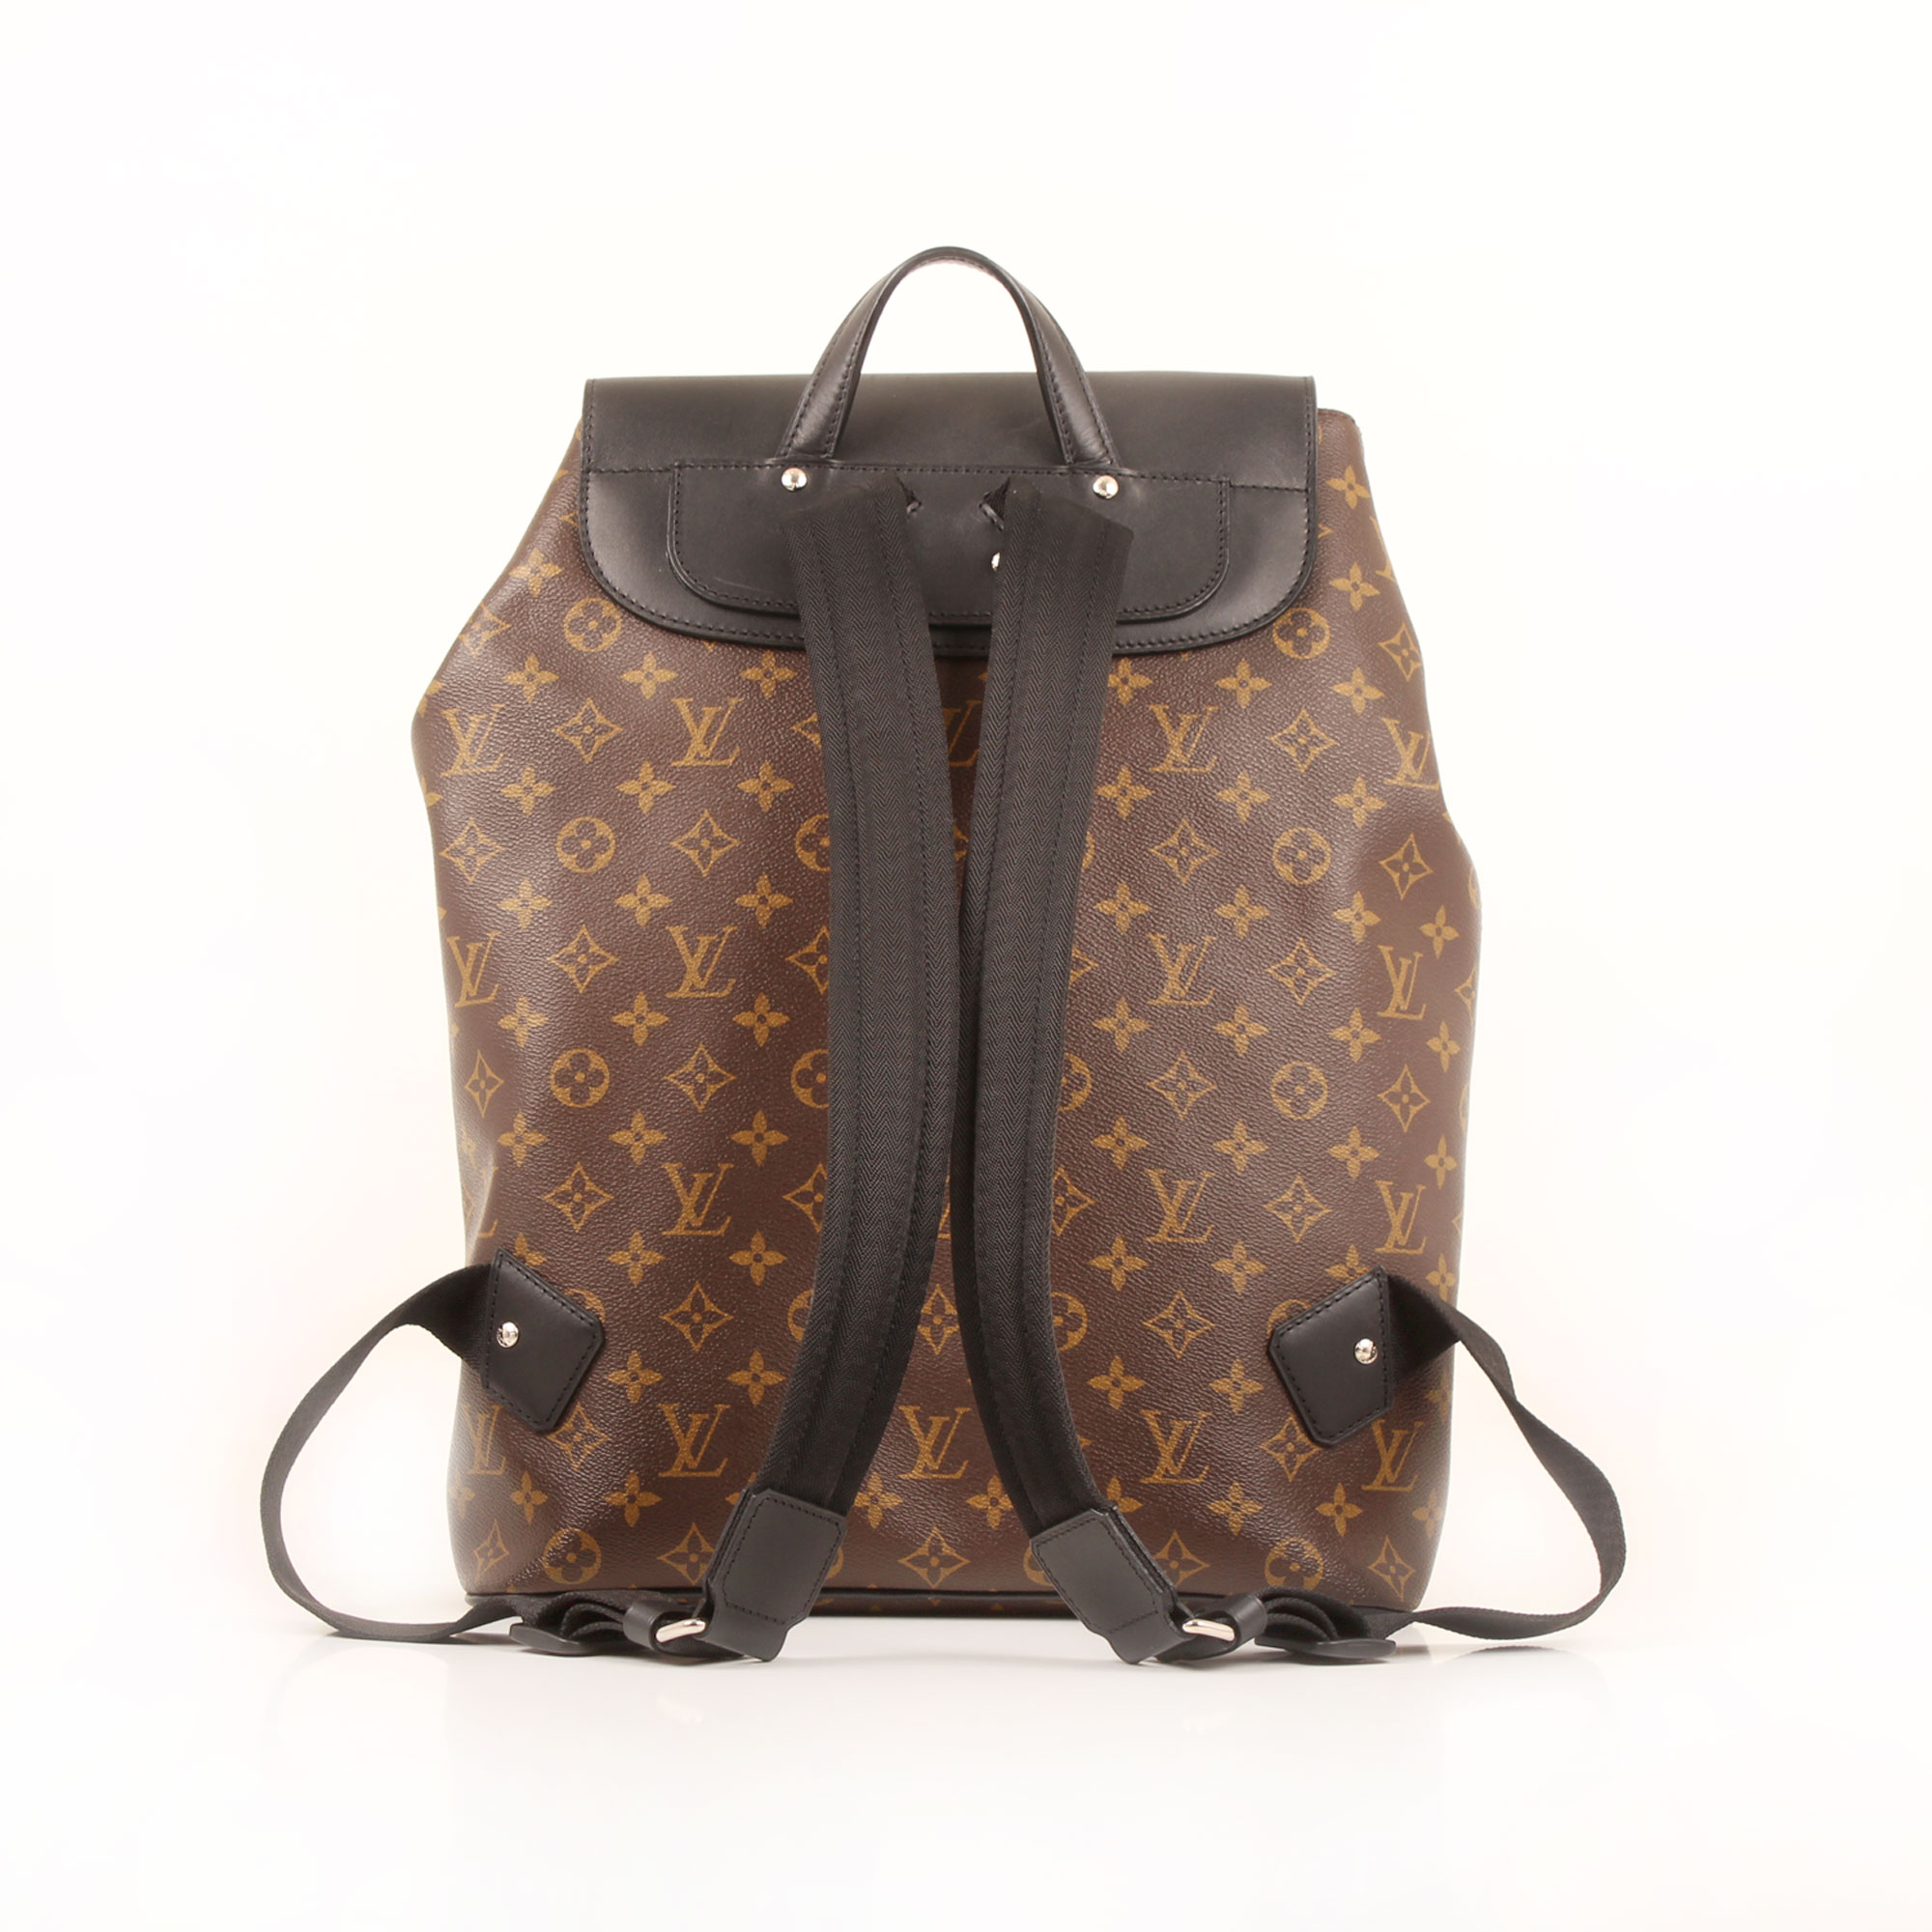 Imagen trasera de la mochila louis vuitton palk monogram macassar